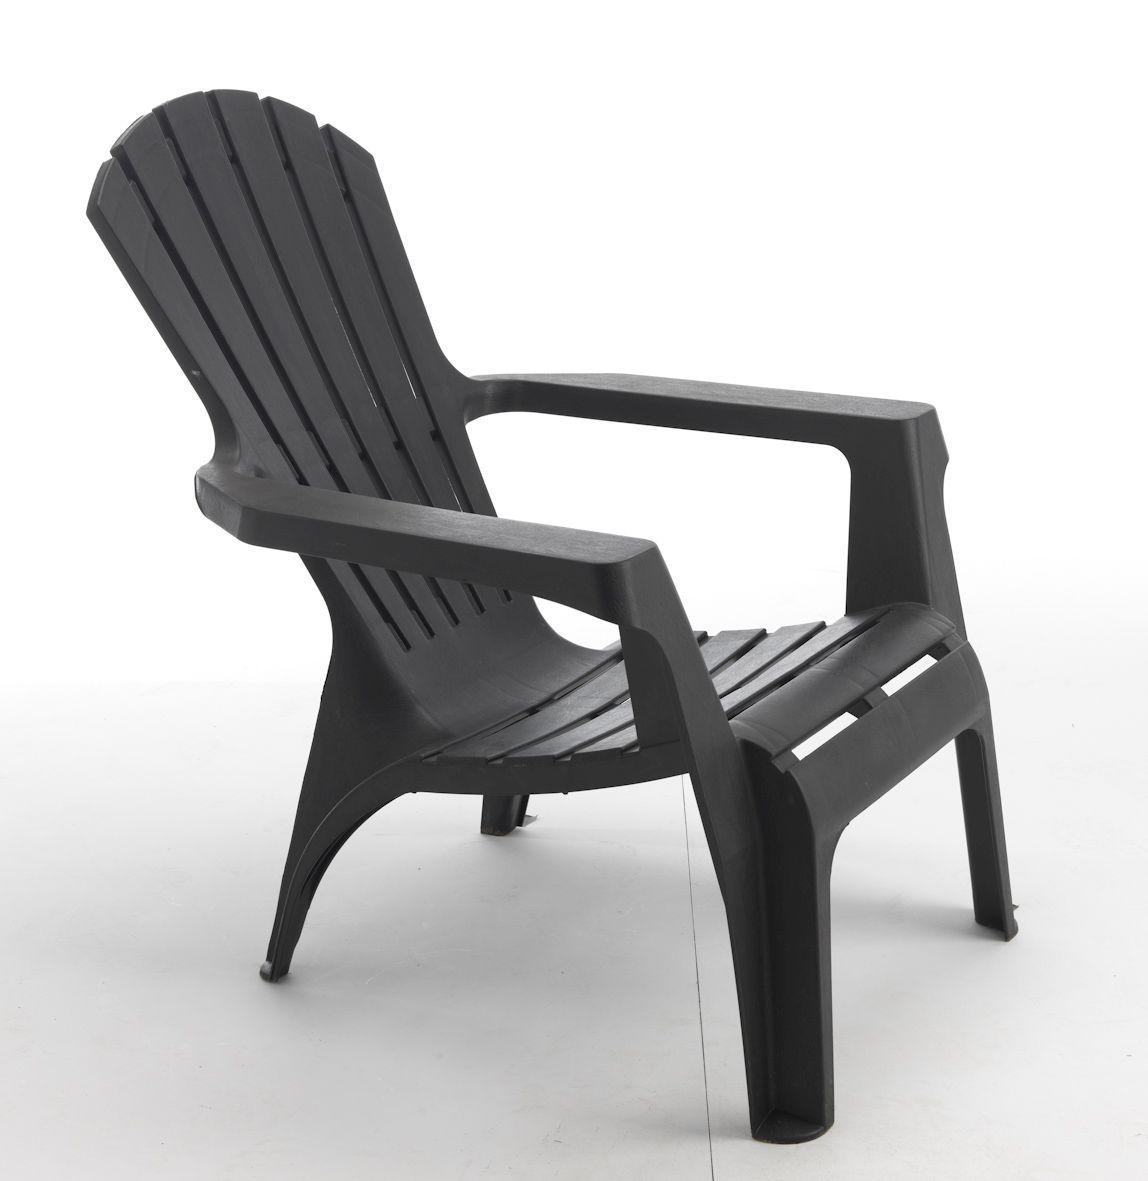 fauteuil de jardin adirondack anthracite wilsa garden. Black Bedroom Furniture Sets. Home Design Ideas